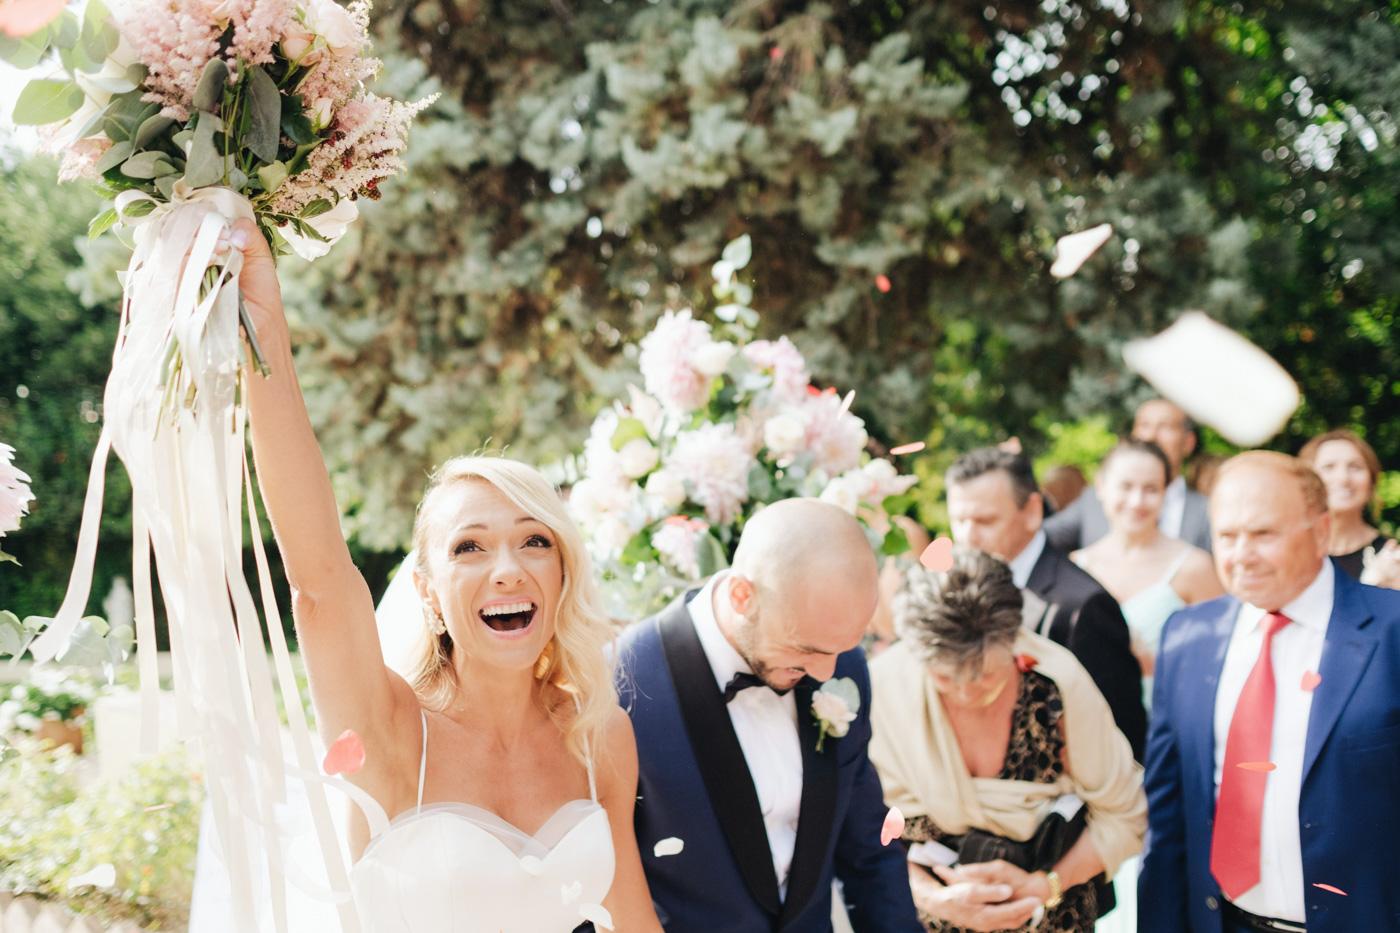 Matrimoni all'italiana wedding photographer italy-92.jpg